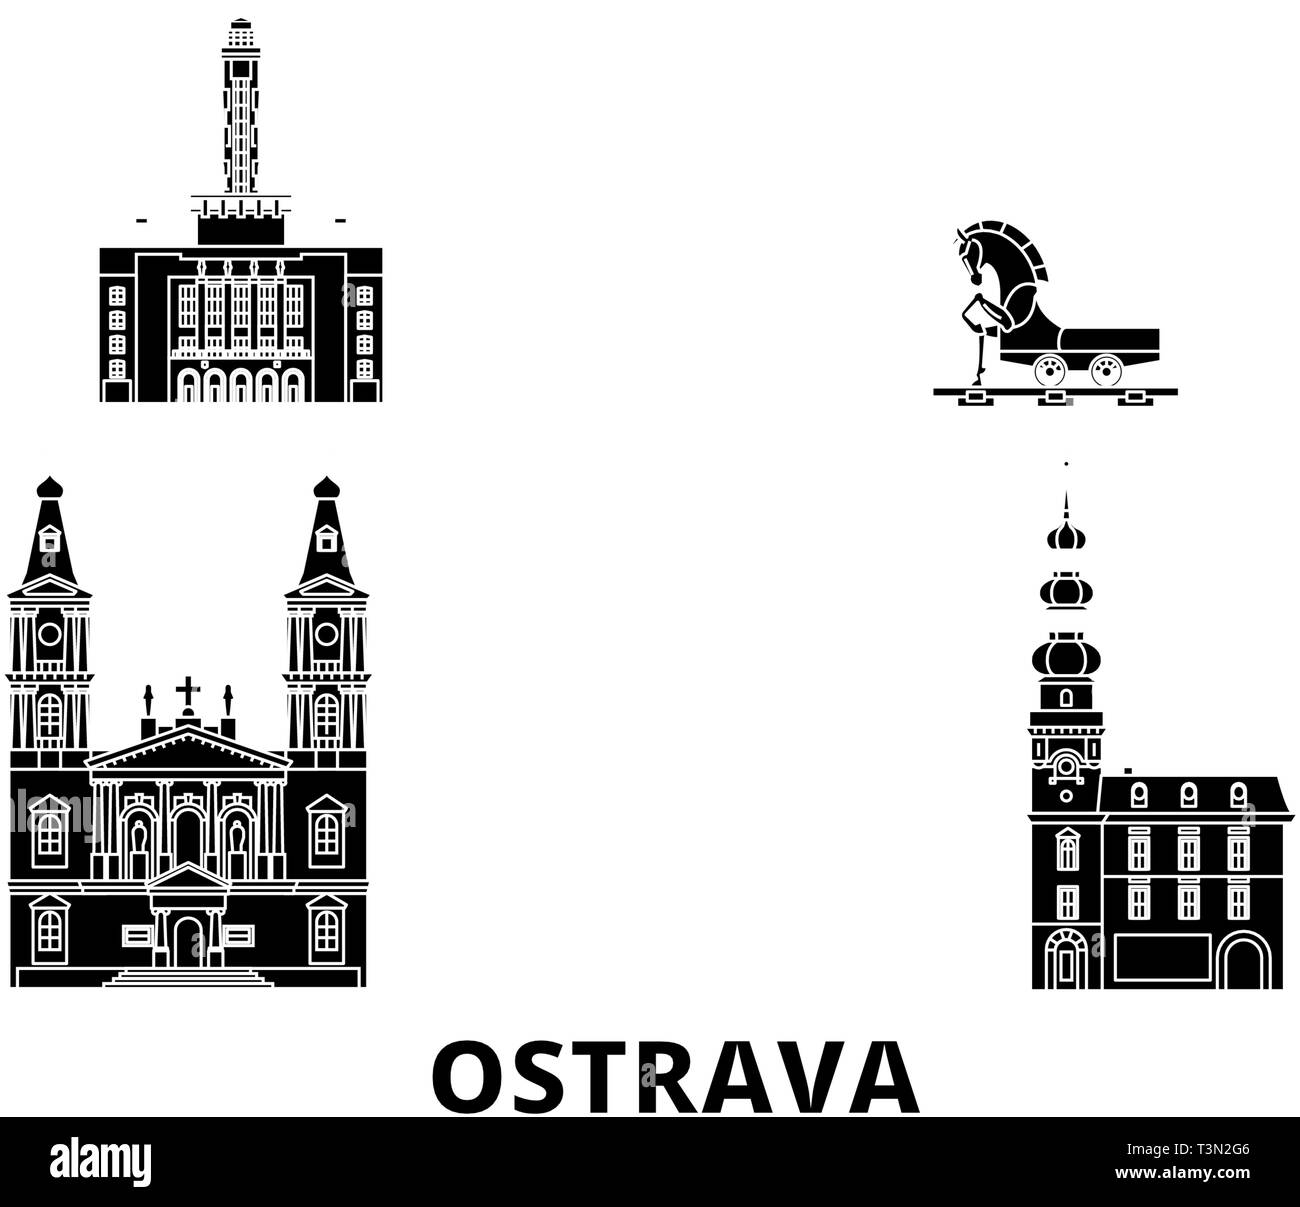 Czech Republic, Ostrava flat travel skyline set. Czech Republic, Ostrava black city vector illustration, symbol, travel sights, landmarks. - Stock Image